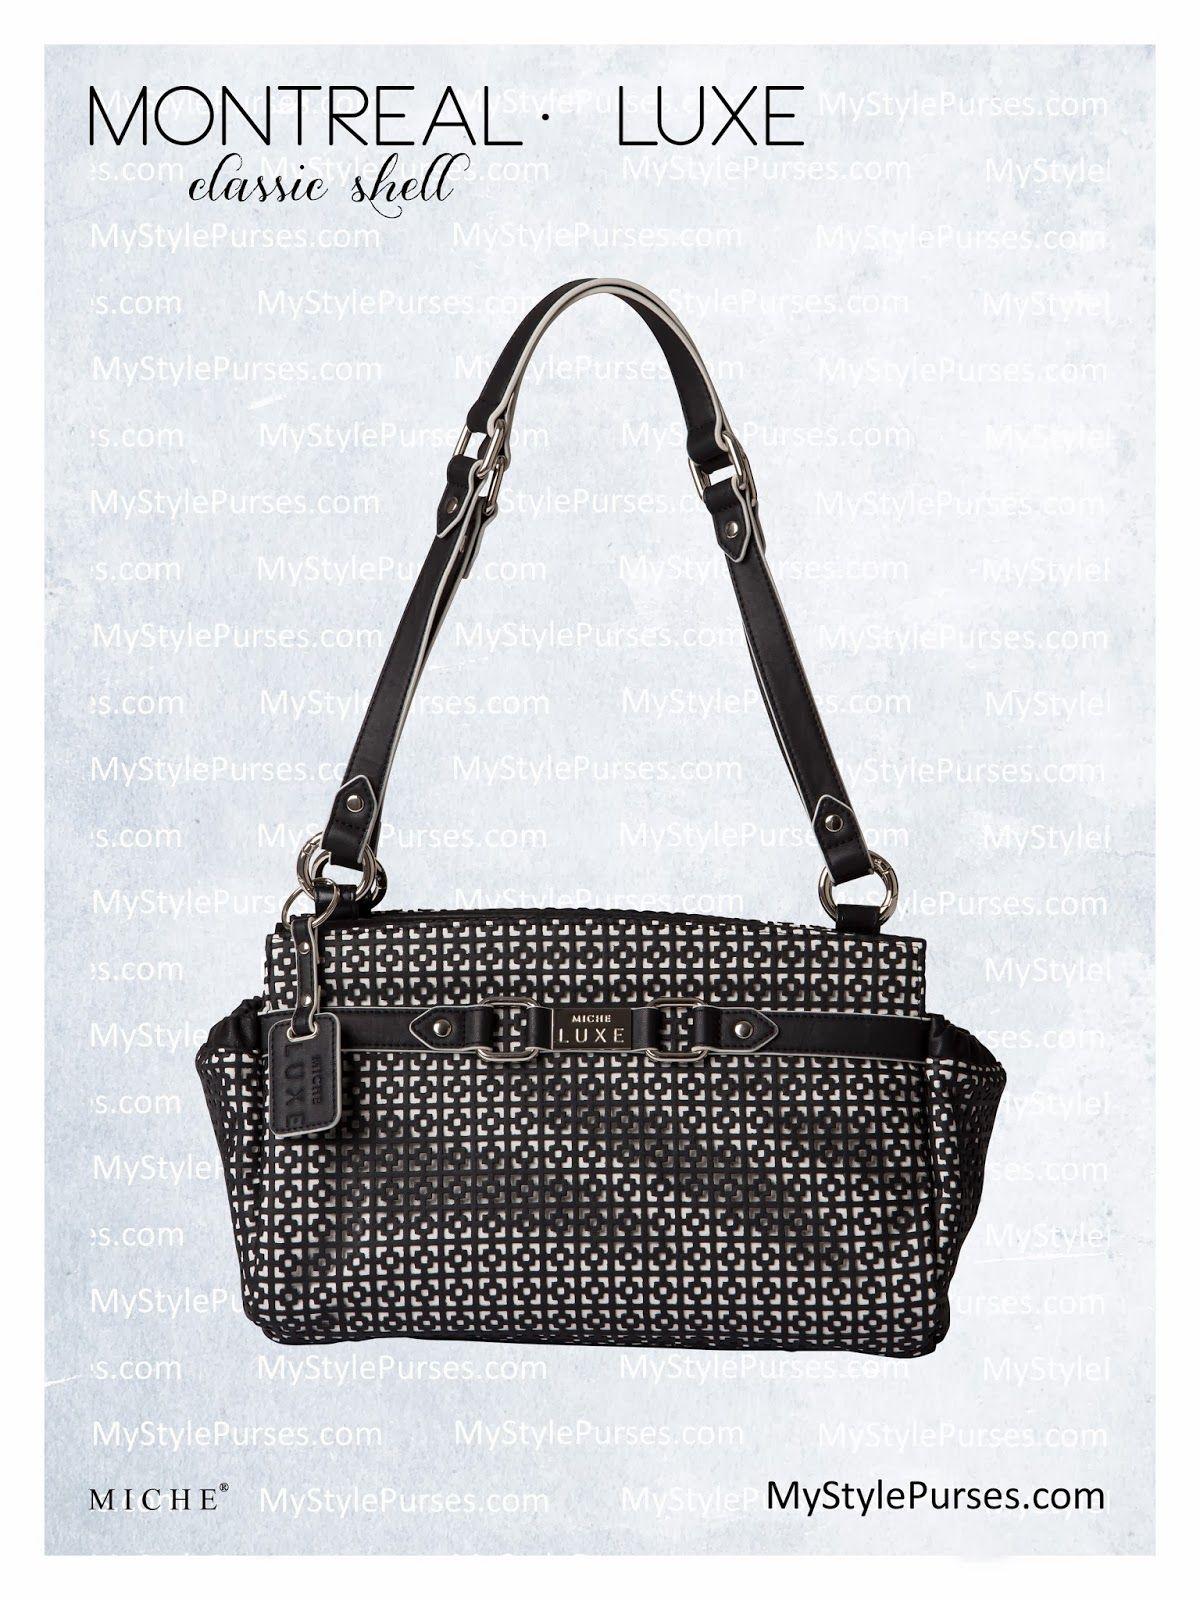 Miche Luxe Montreal Classic Handbag Shell Mystylepurses